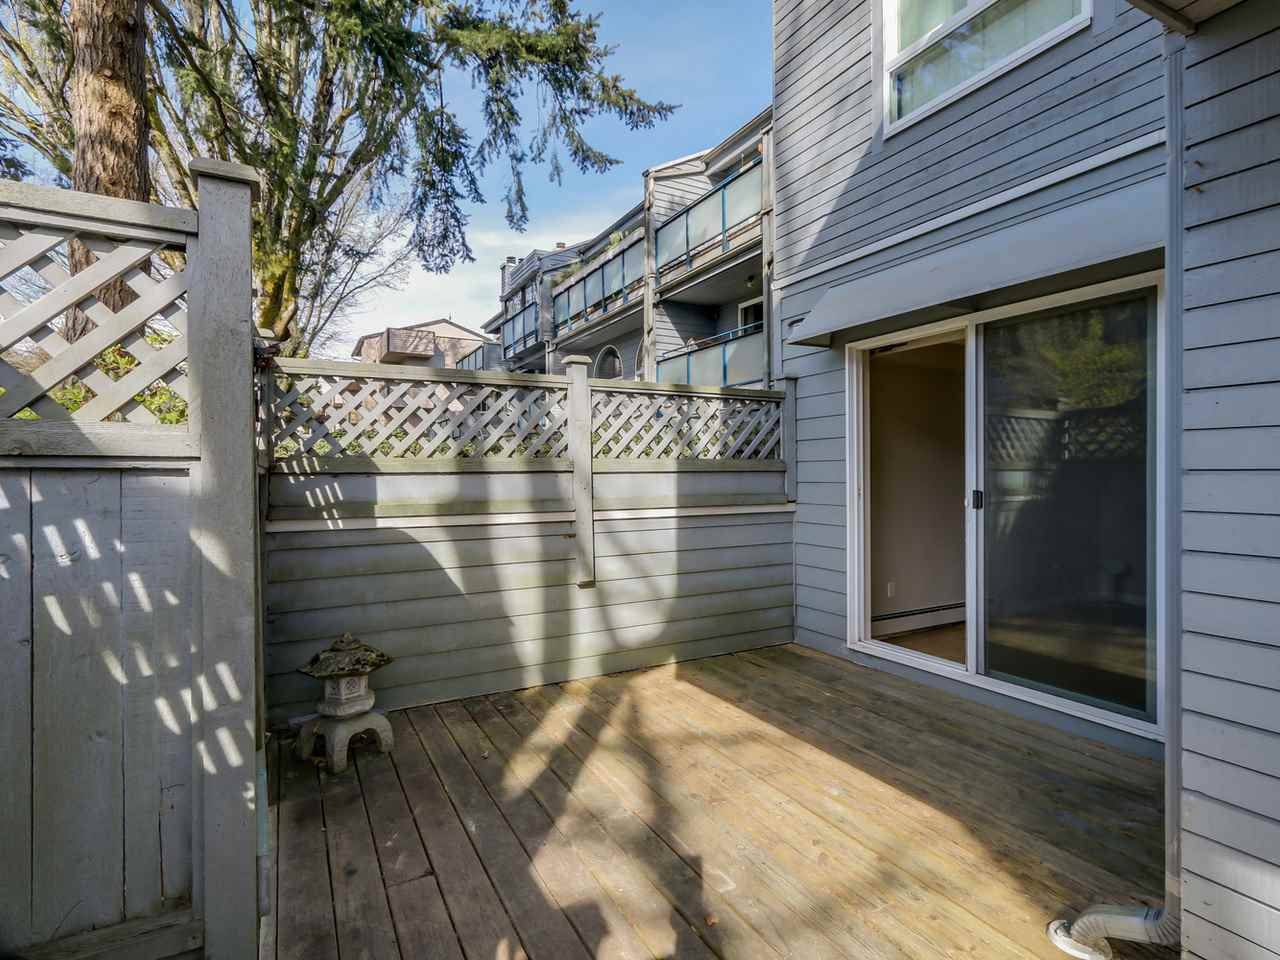 "Photo 5: Photos: 115 2125 YORK Avenue in Vancouver: Kitsilano Condo for sale in ""YORK GARDENS"" (Vancouver West)  : MLS®# R2054686"